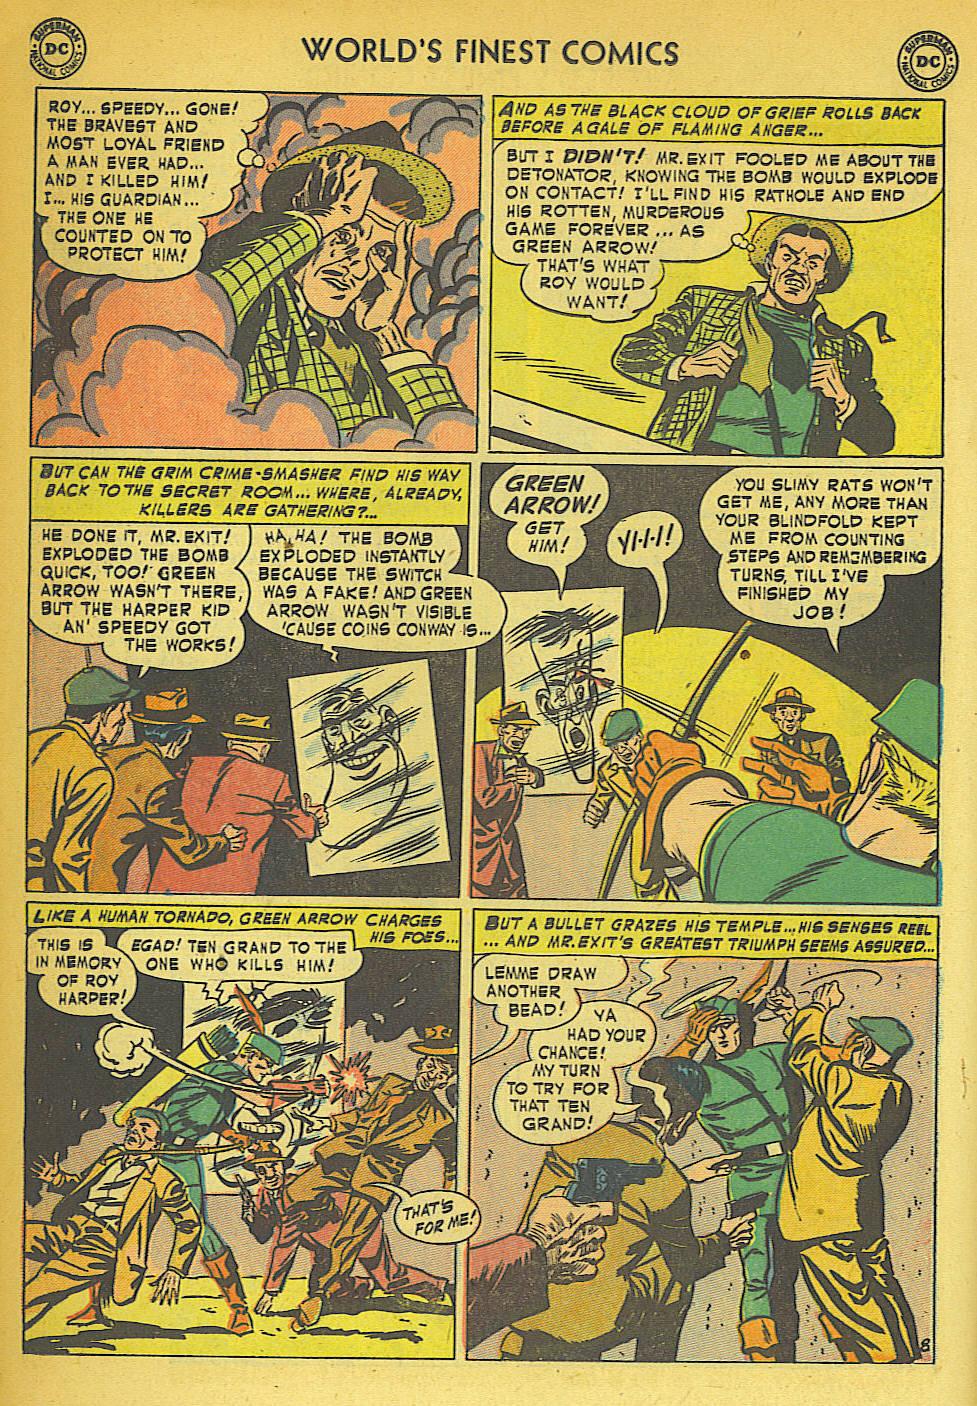 Read online World's Finest Comics comic -  Issue #57 - 24